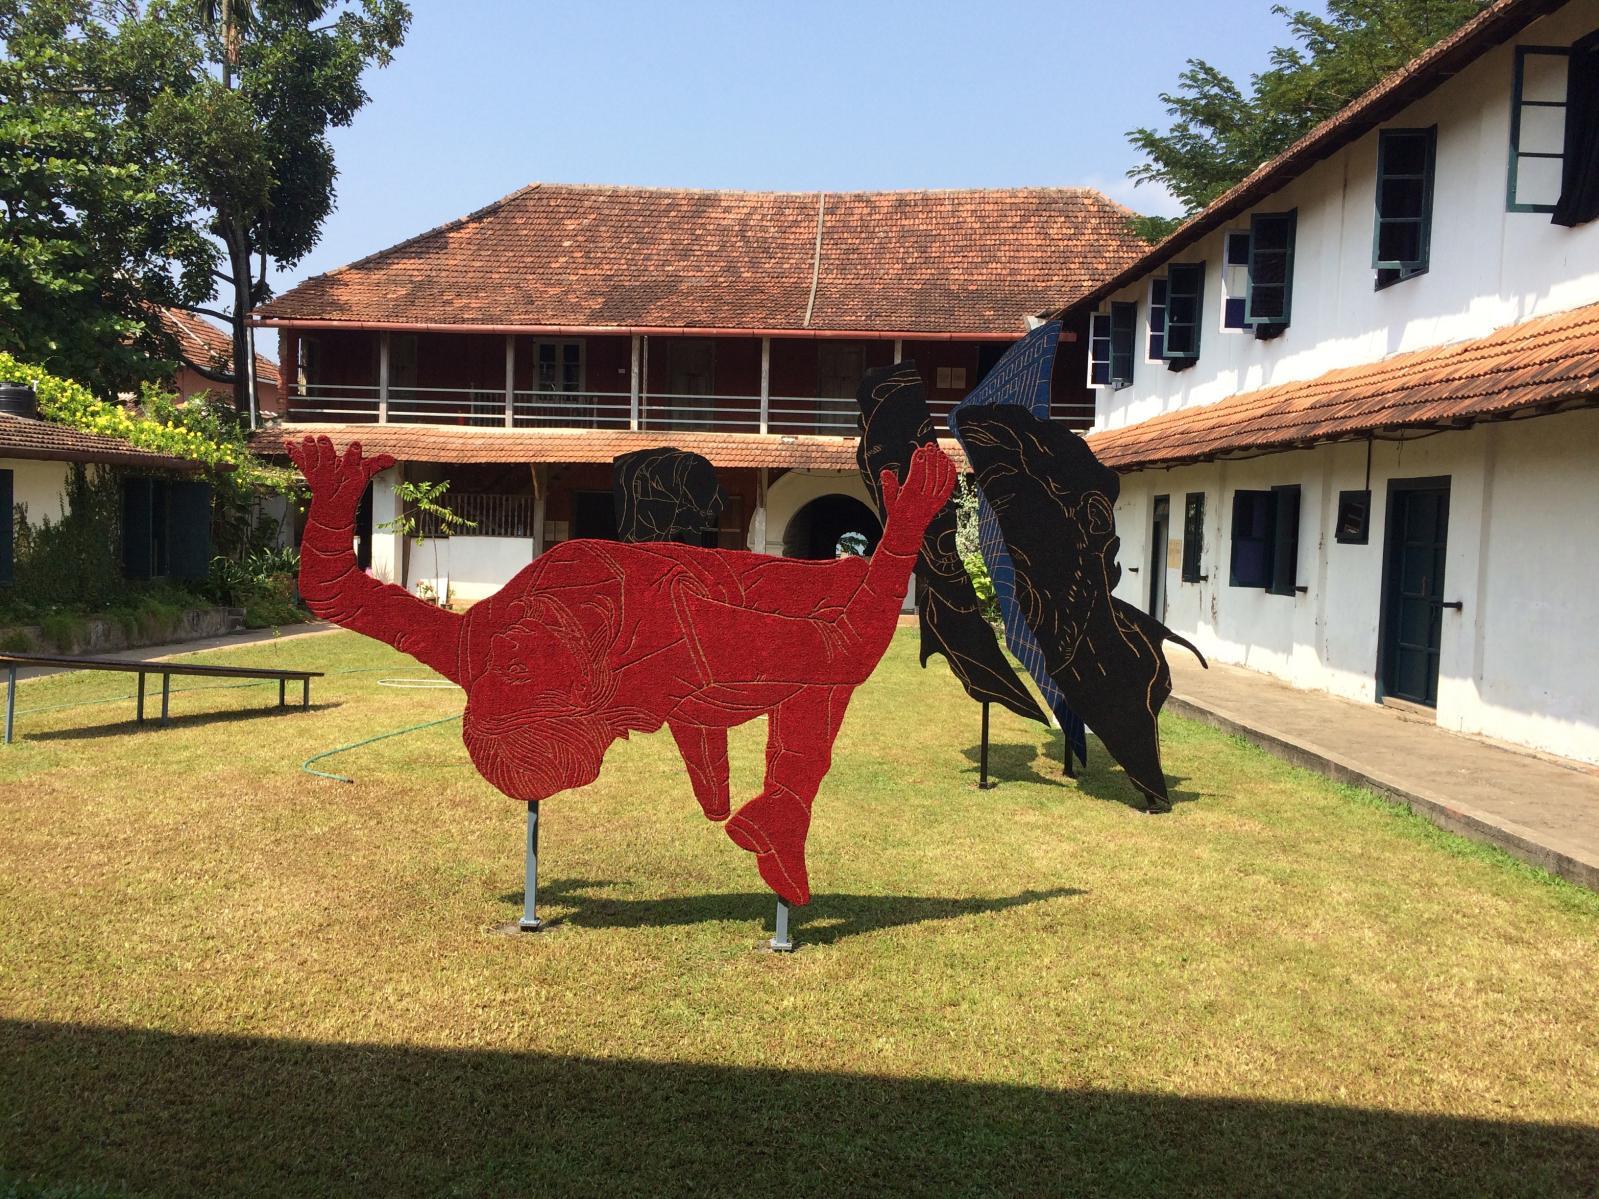 Installation view at Pepper House, Kochi-Muziris Biennale 2016, Praneet Soi's, 'Cut-Out Archive' (2016).Courtesy Kochi-Muziris Biennale